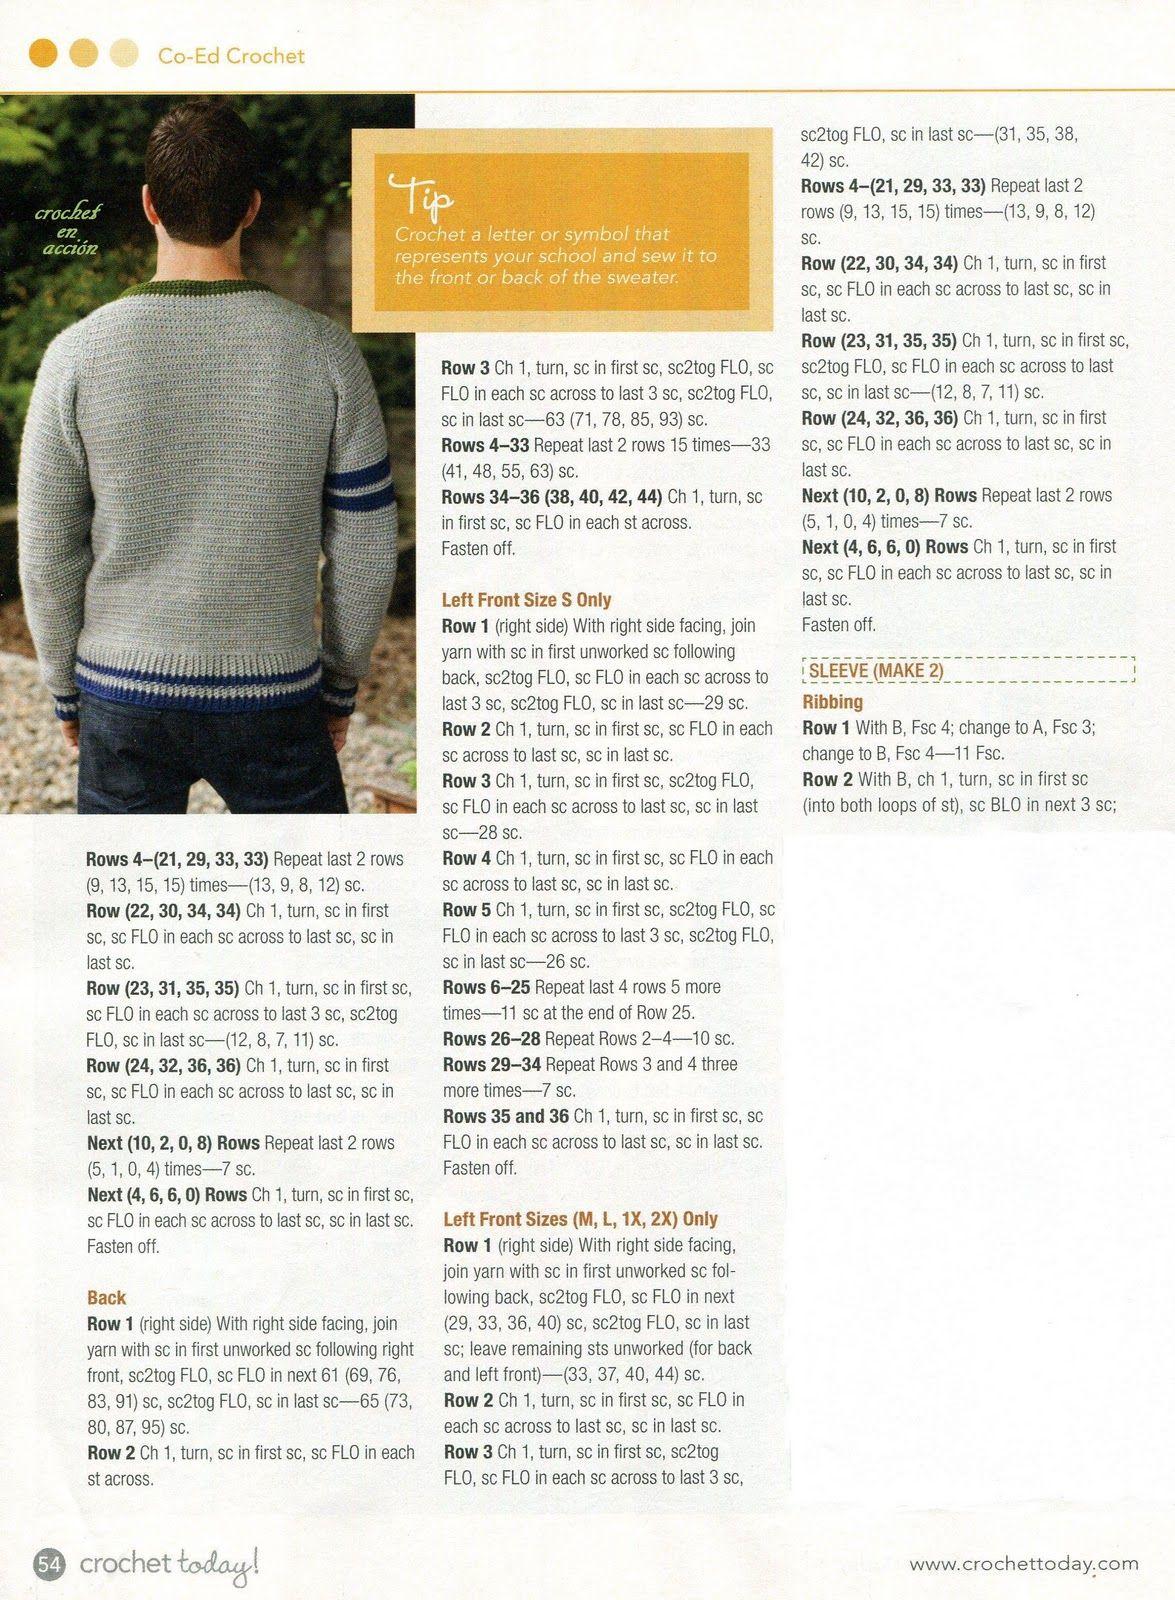 Crochet En Acción: Sweater y Pullover | erkek orguleri | Pinterest ...